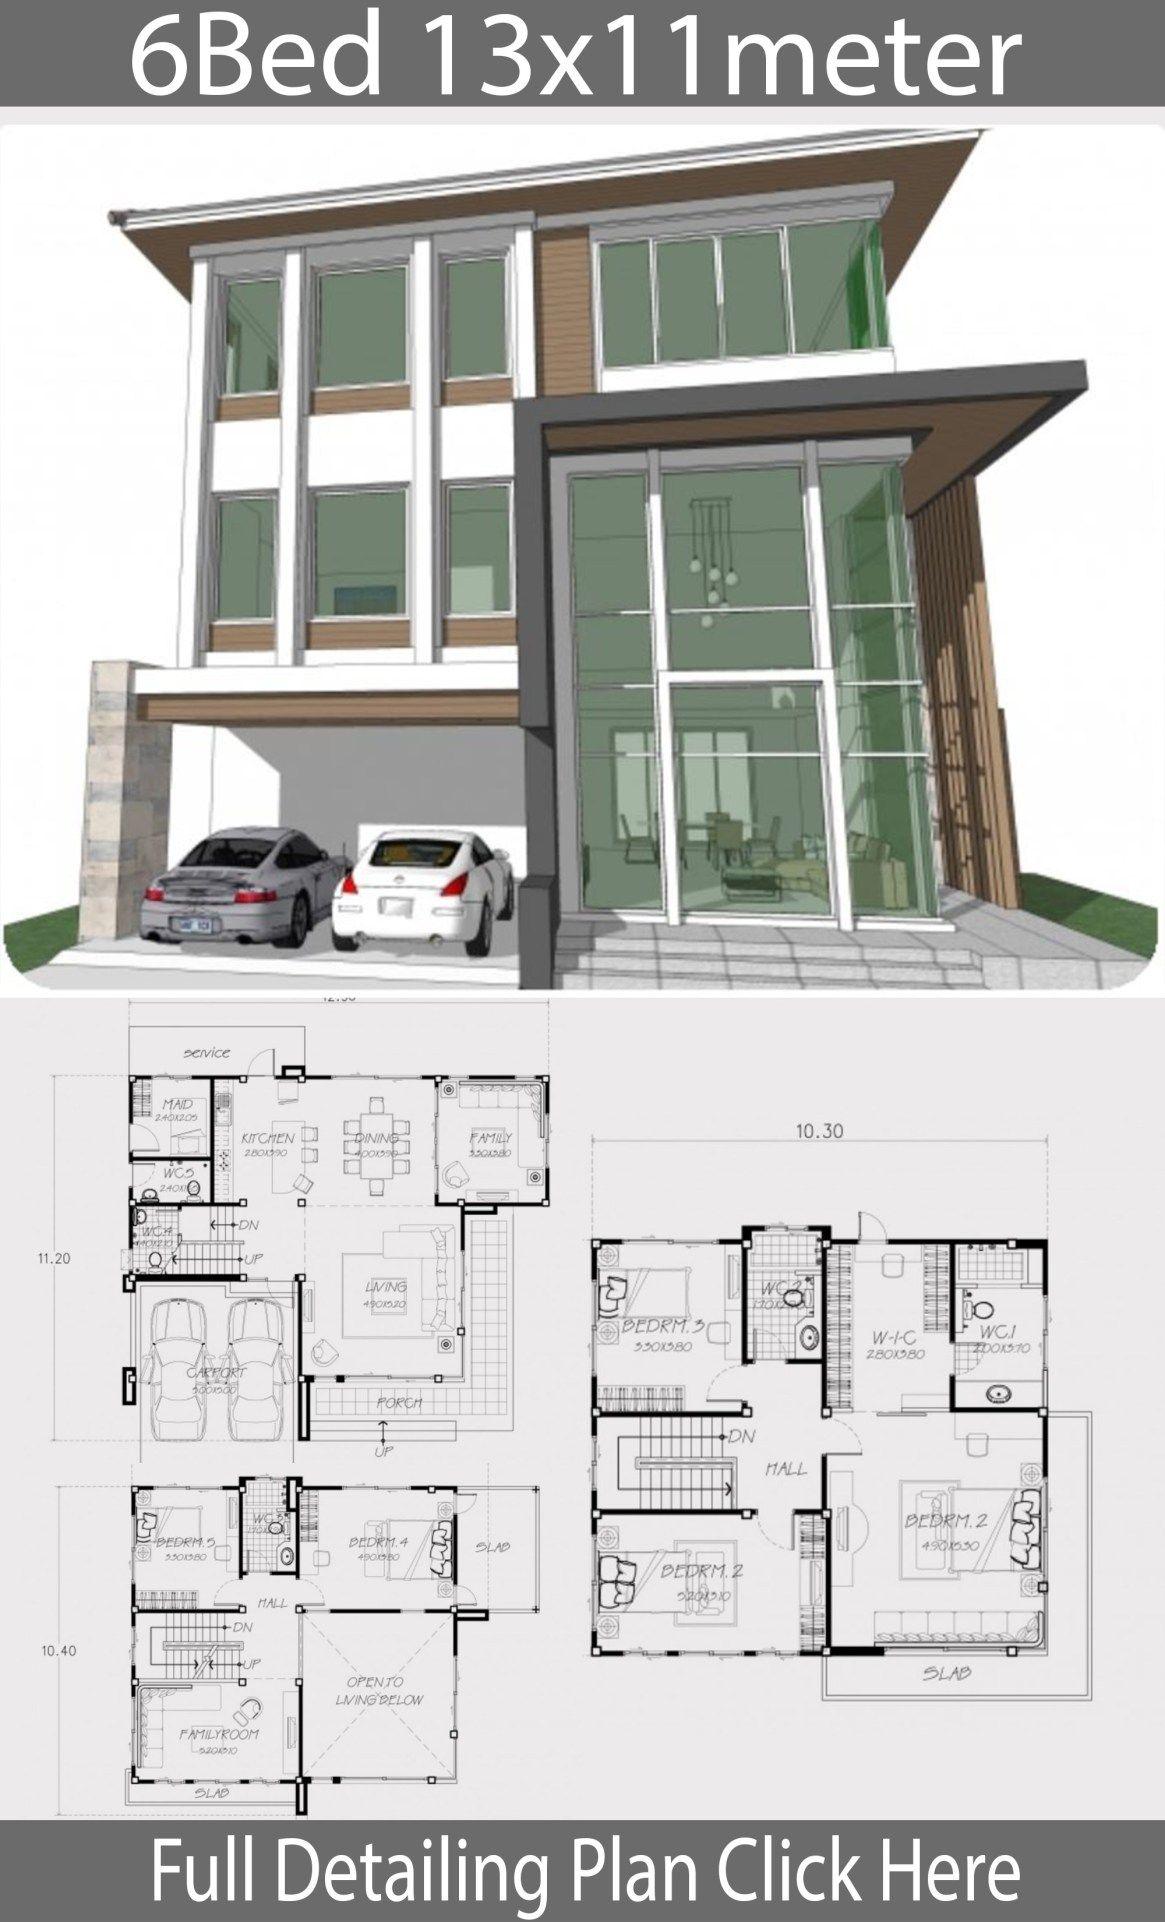 Home Design Plan 13x11m With 6 Bedrooms Home Design With Plansearch Home Building Design Home Design Plan House Floor Design